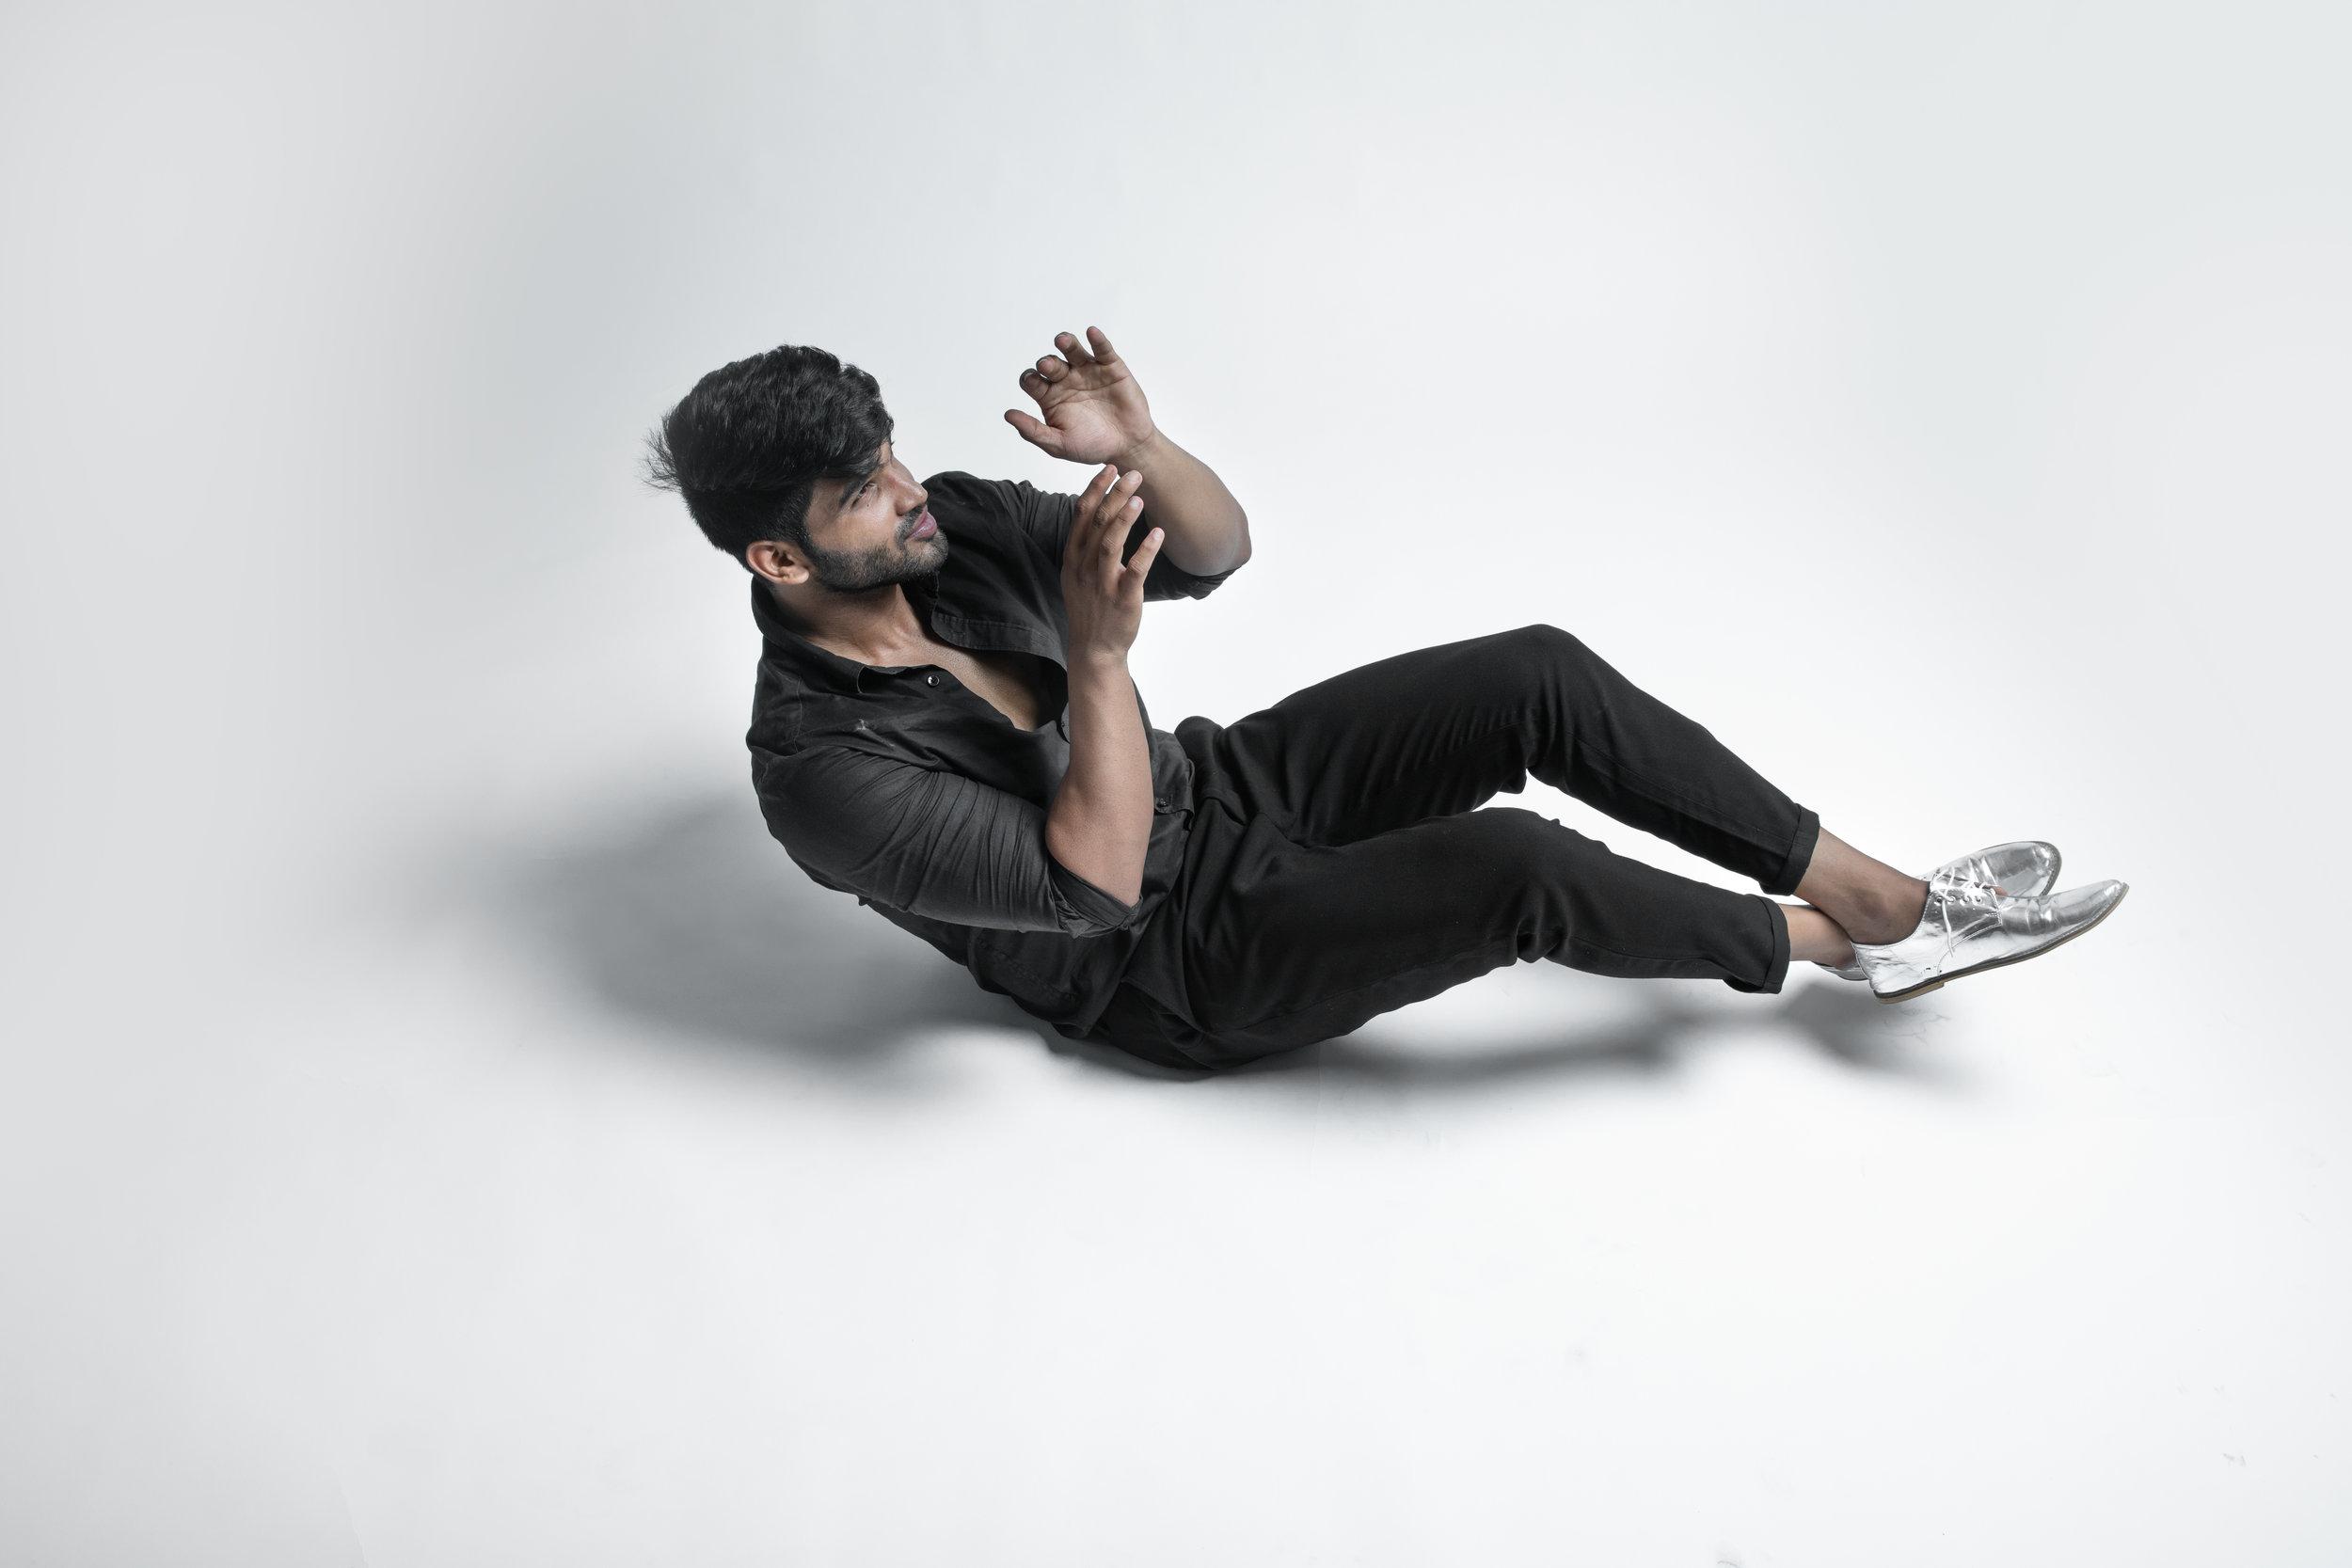 Male Model Fashion Photographer